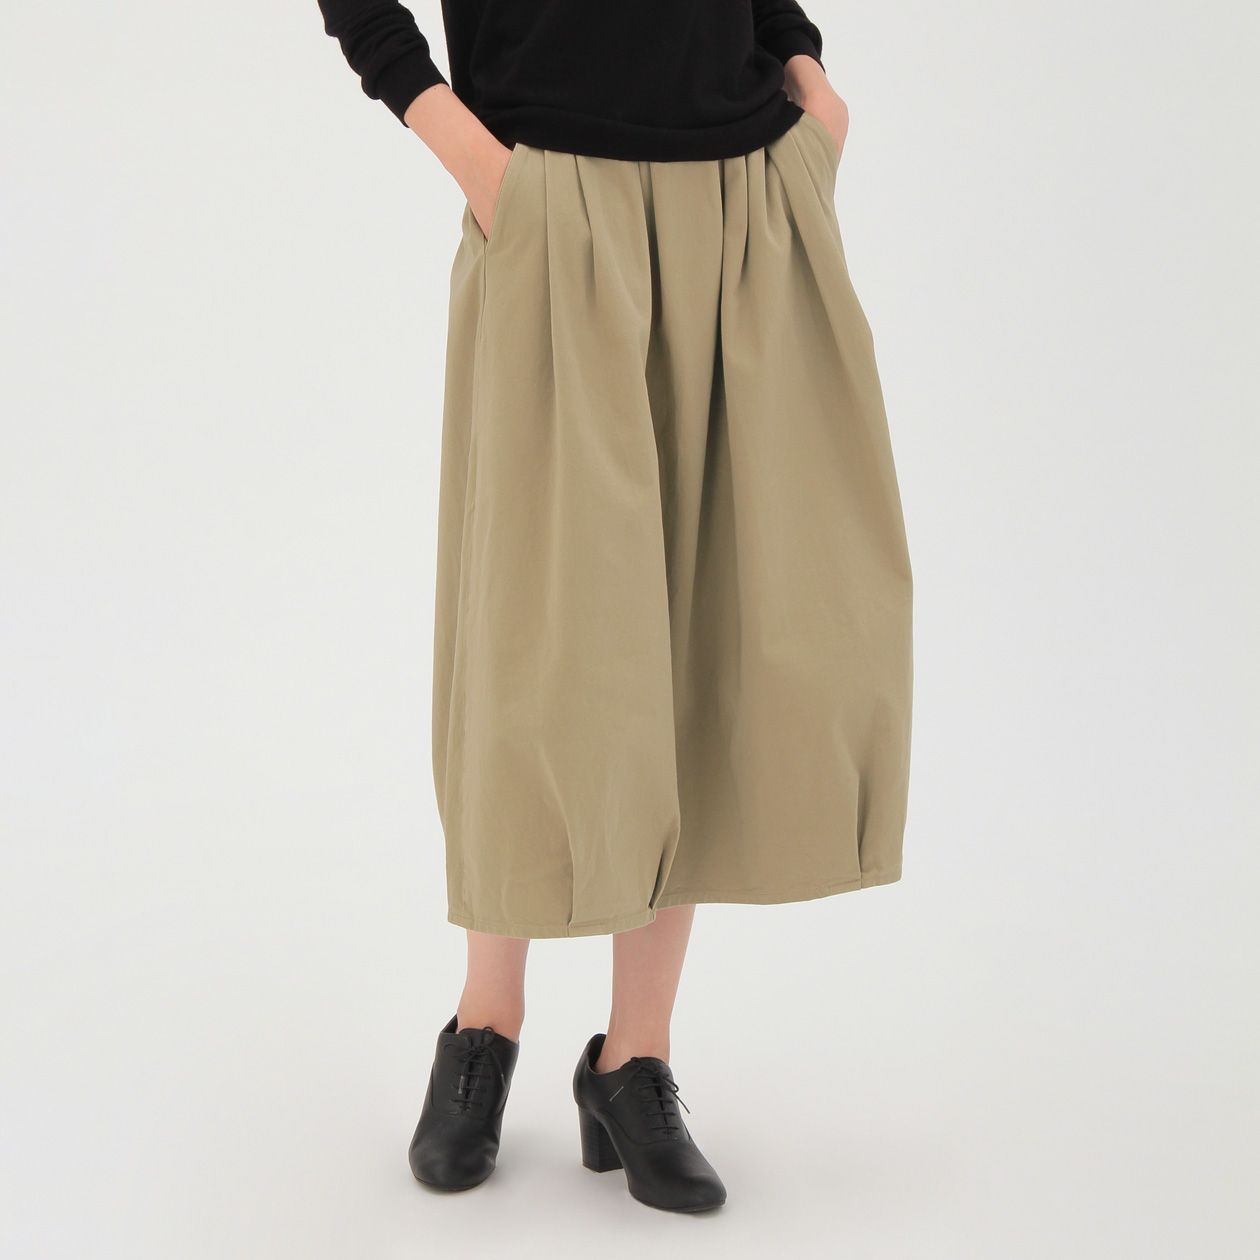 367975cd9a942e オーガニックコットン縦横ストレッチチノイージーバルーンスカート 婦人S・ベージュ | 無印良品ネット